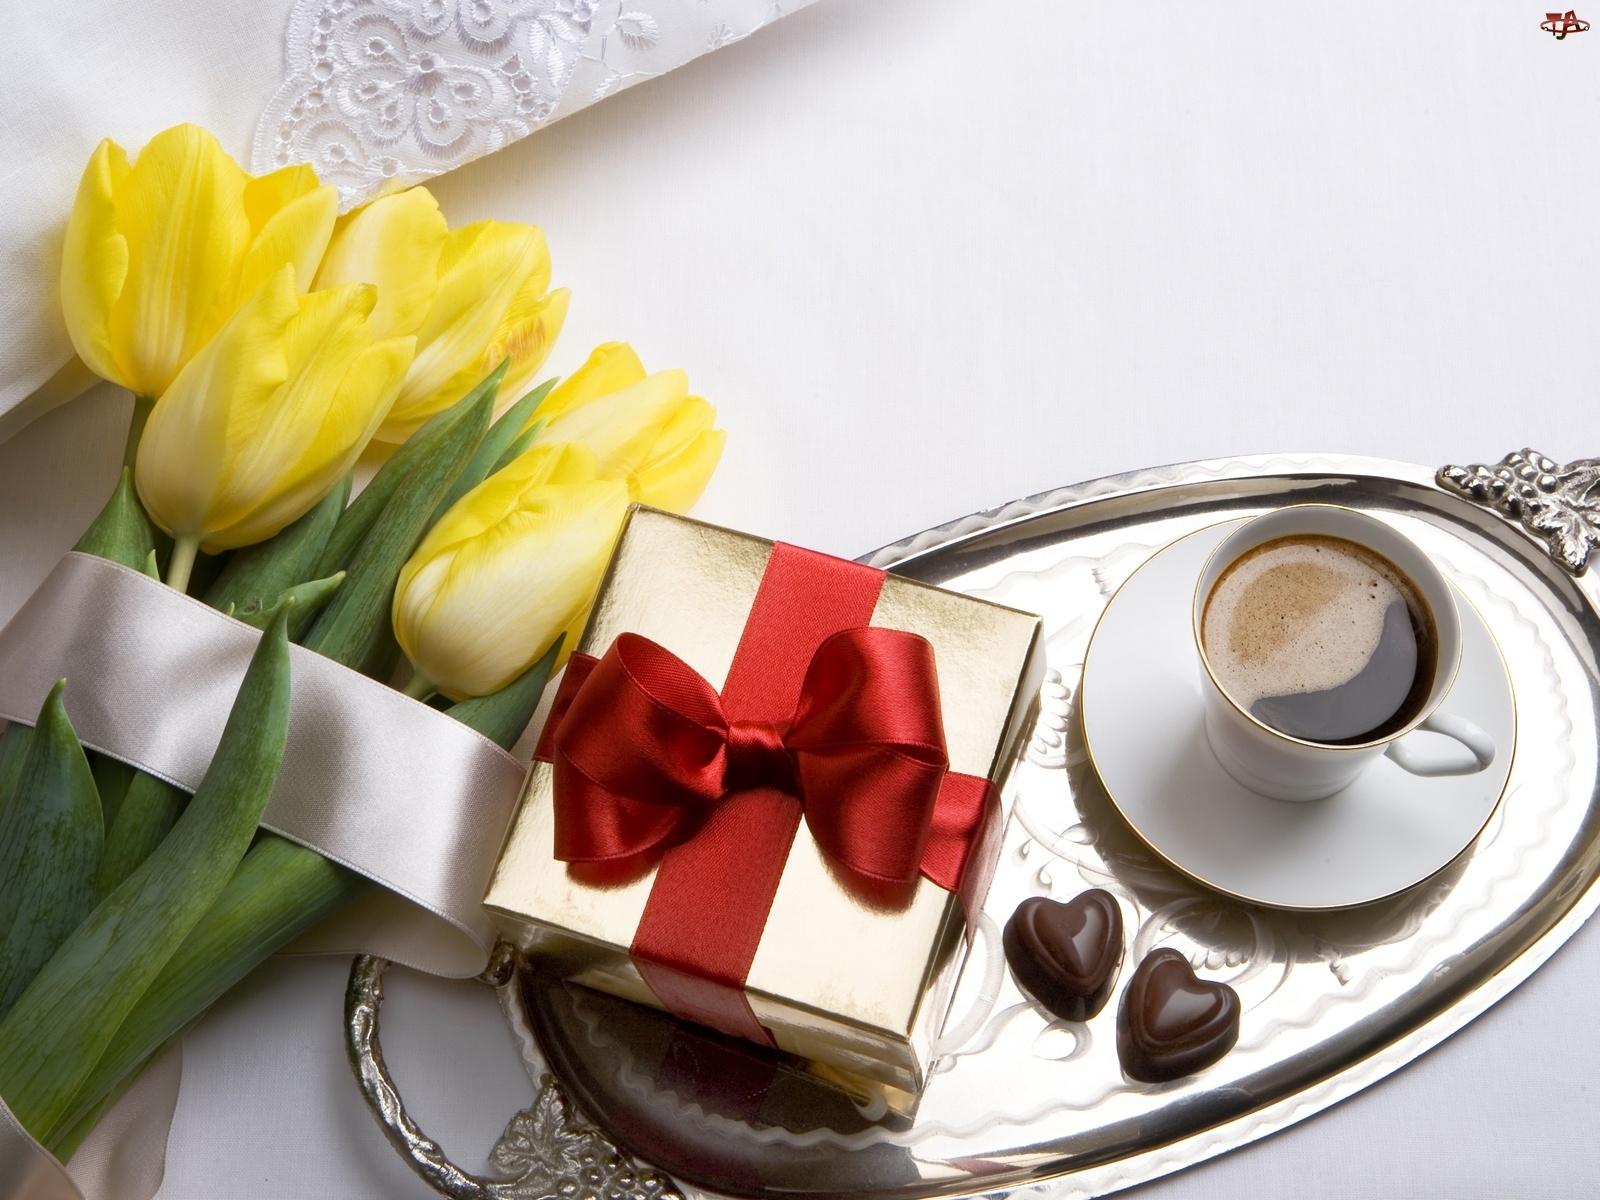 Żółte, Prezencik, Tulipany, Kawa